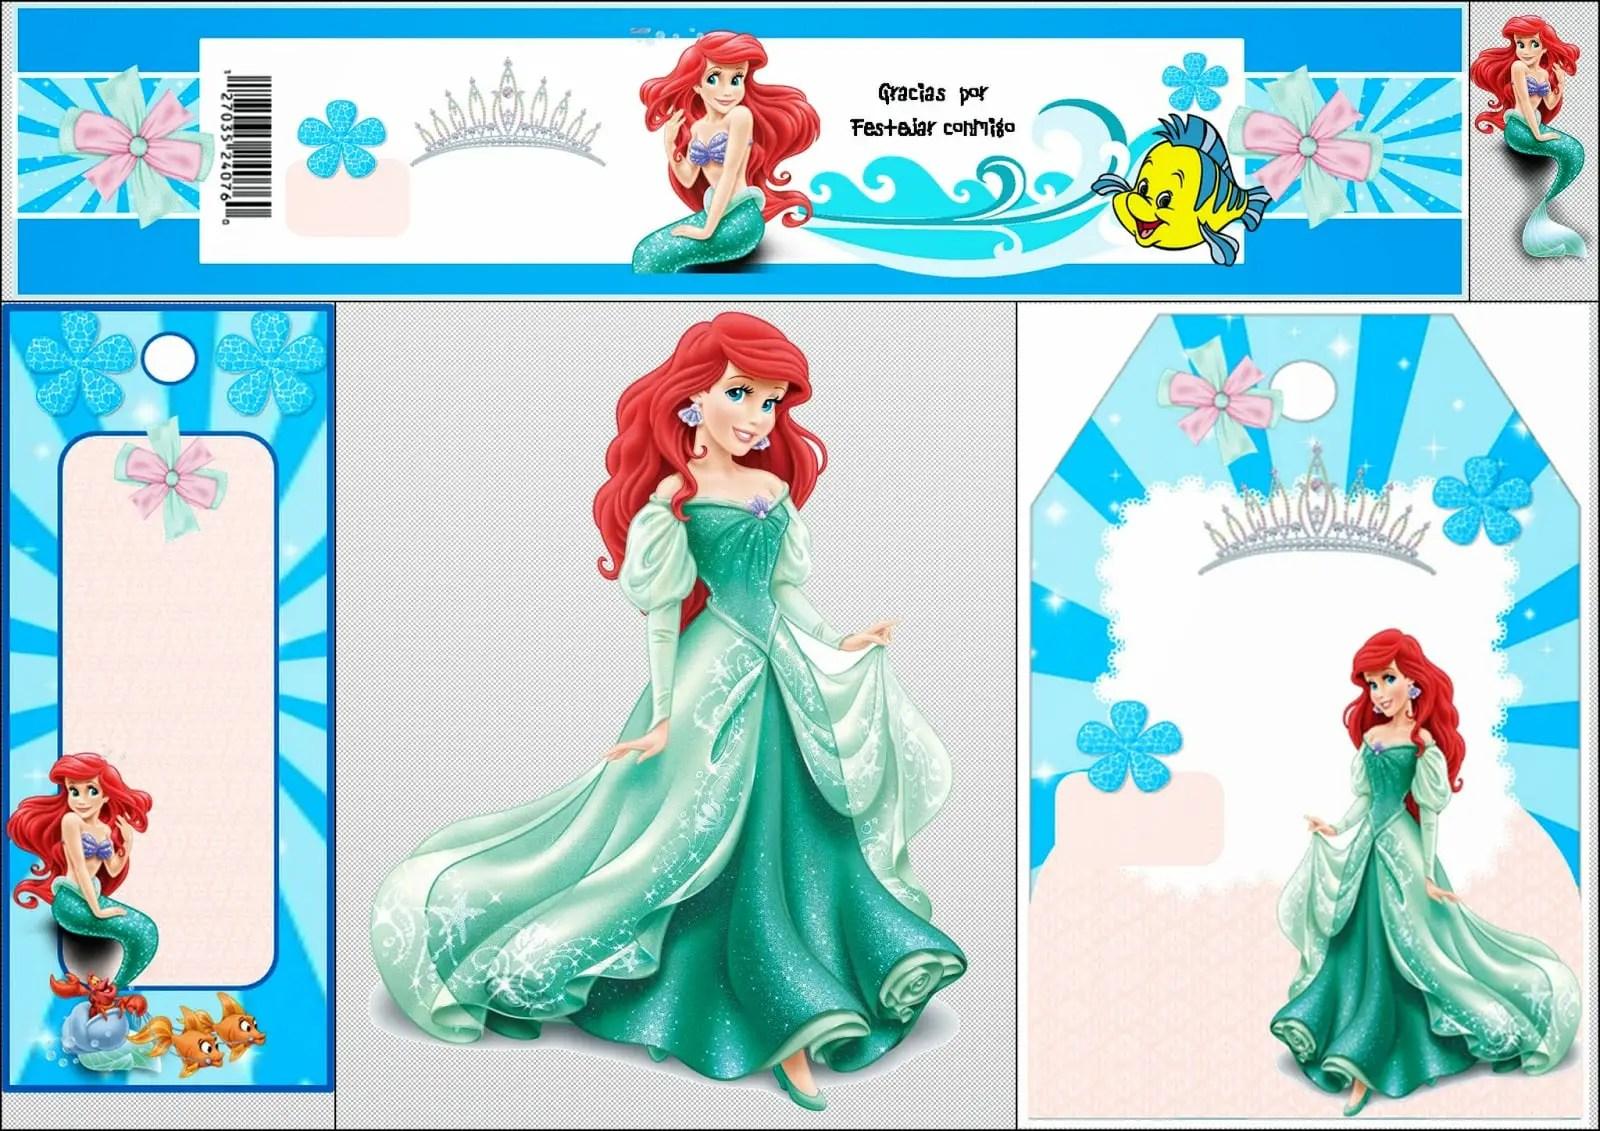 Imprimibles gratis de La Sirenita Ariel - Dale Detalles